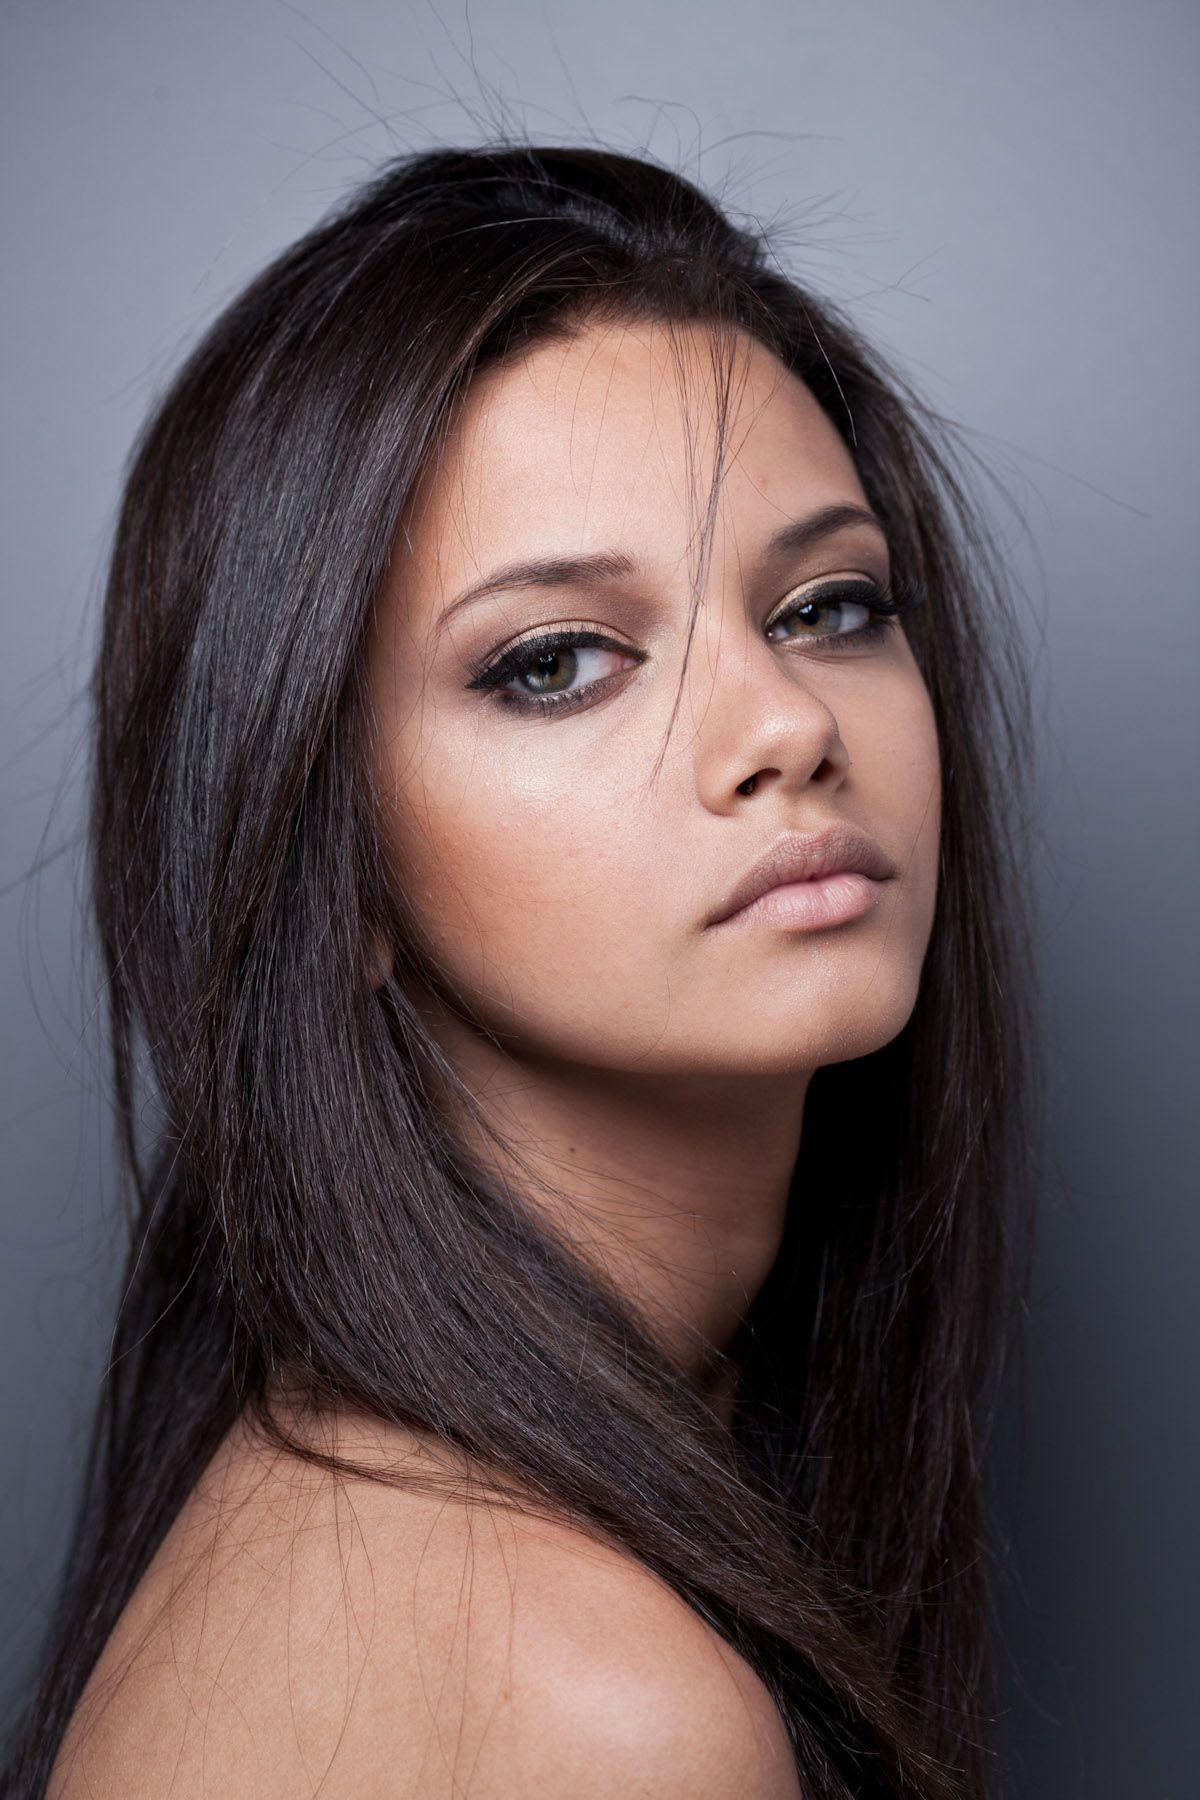 Love This Natural Makeup Look. Just A